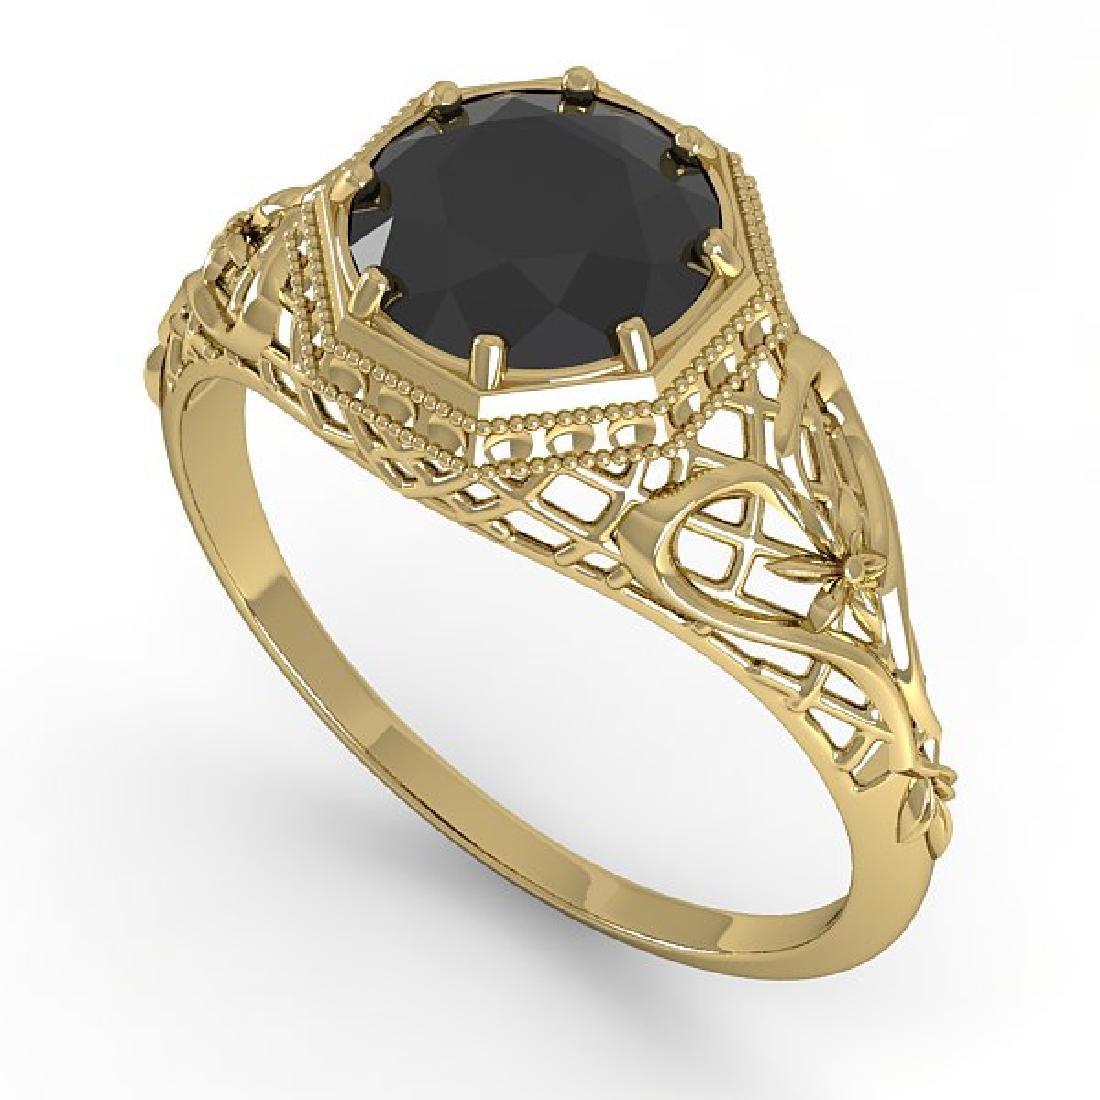 1.50 CTW Black Certified Diamond Ring Art Deco 14K - 2